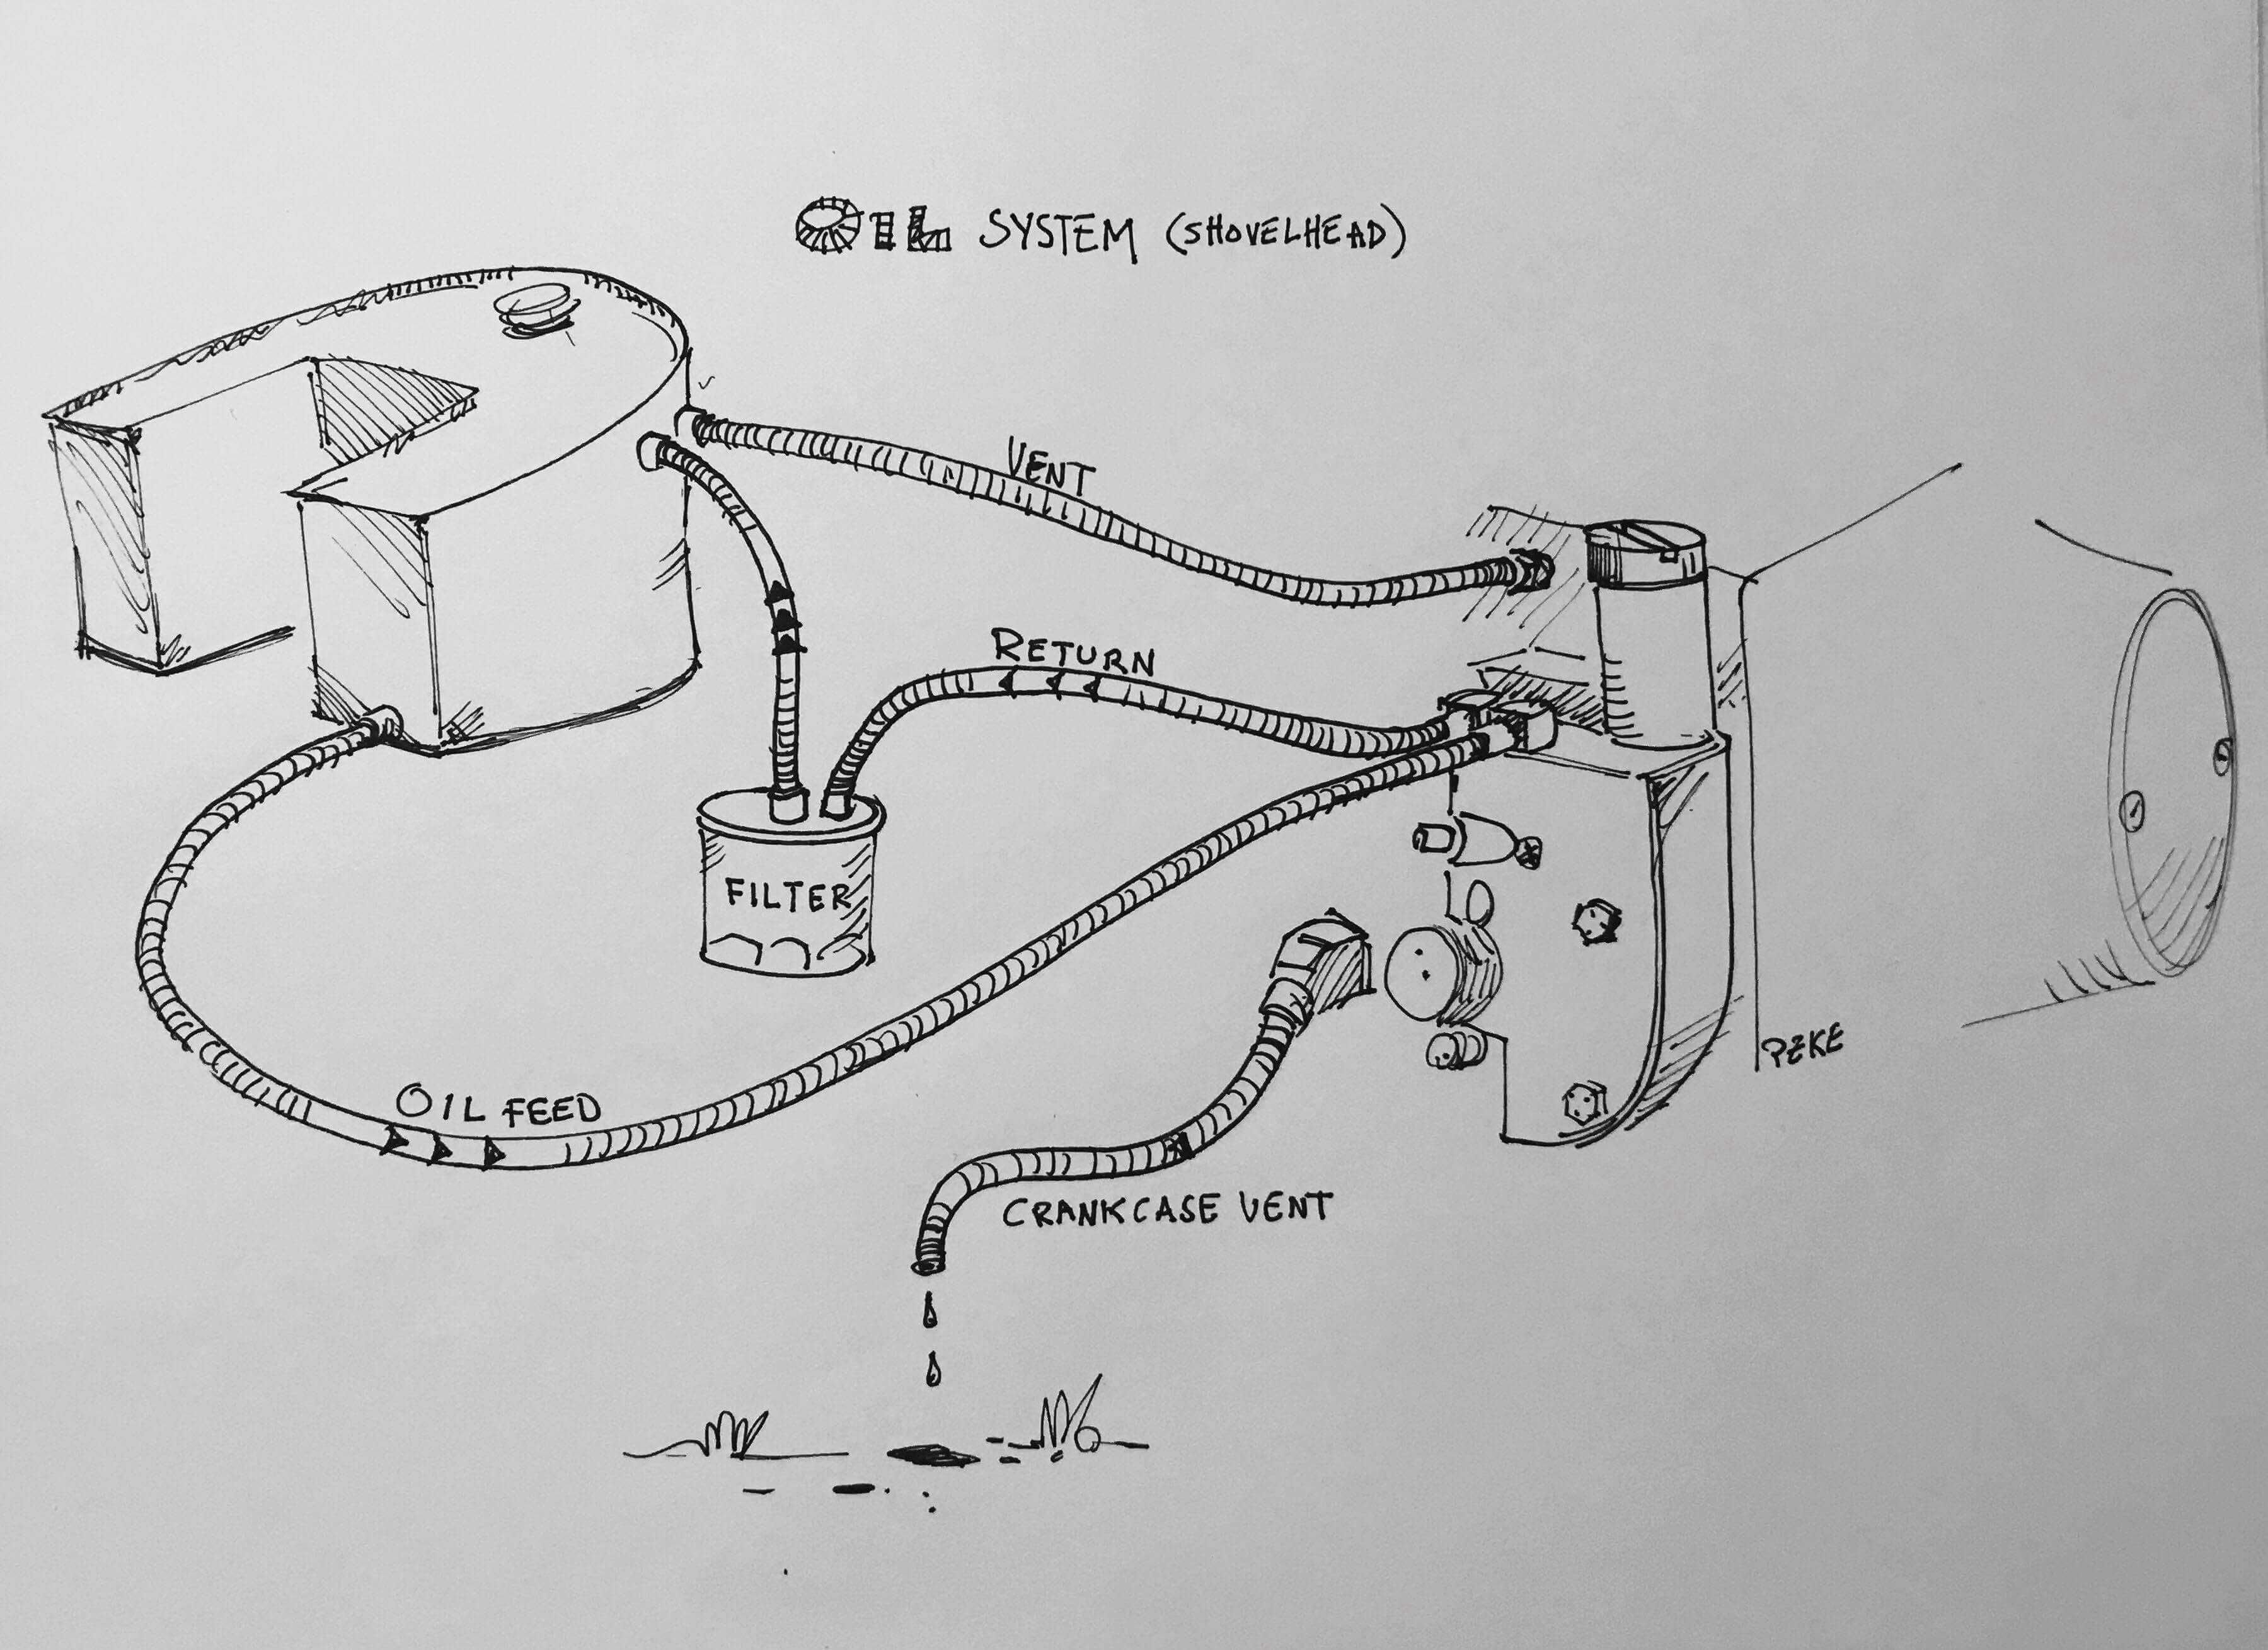 system schematic further harley shovelhead oil system diagram on diagram for engine also sportster oil line [ 3599 x 2619 Pixel ]